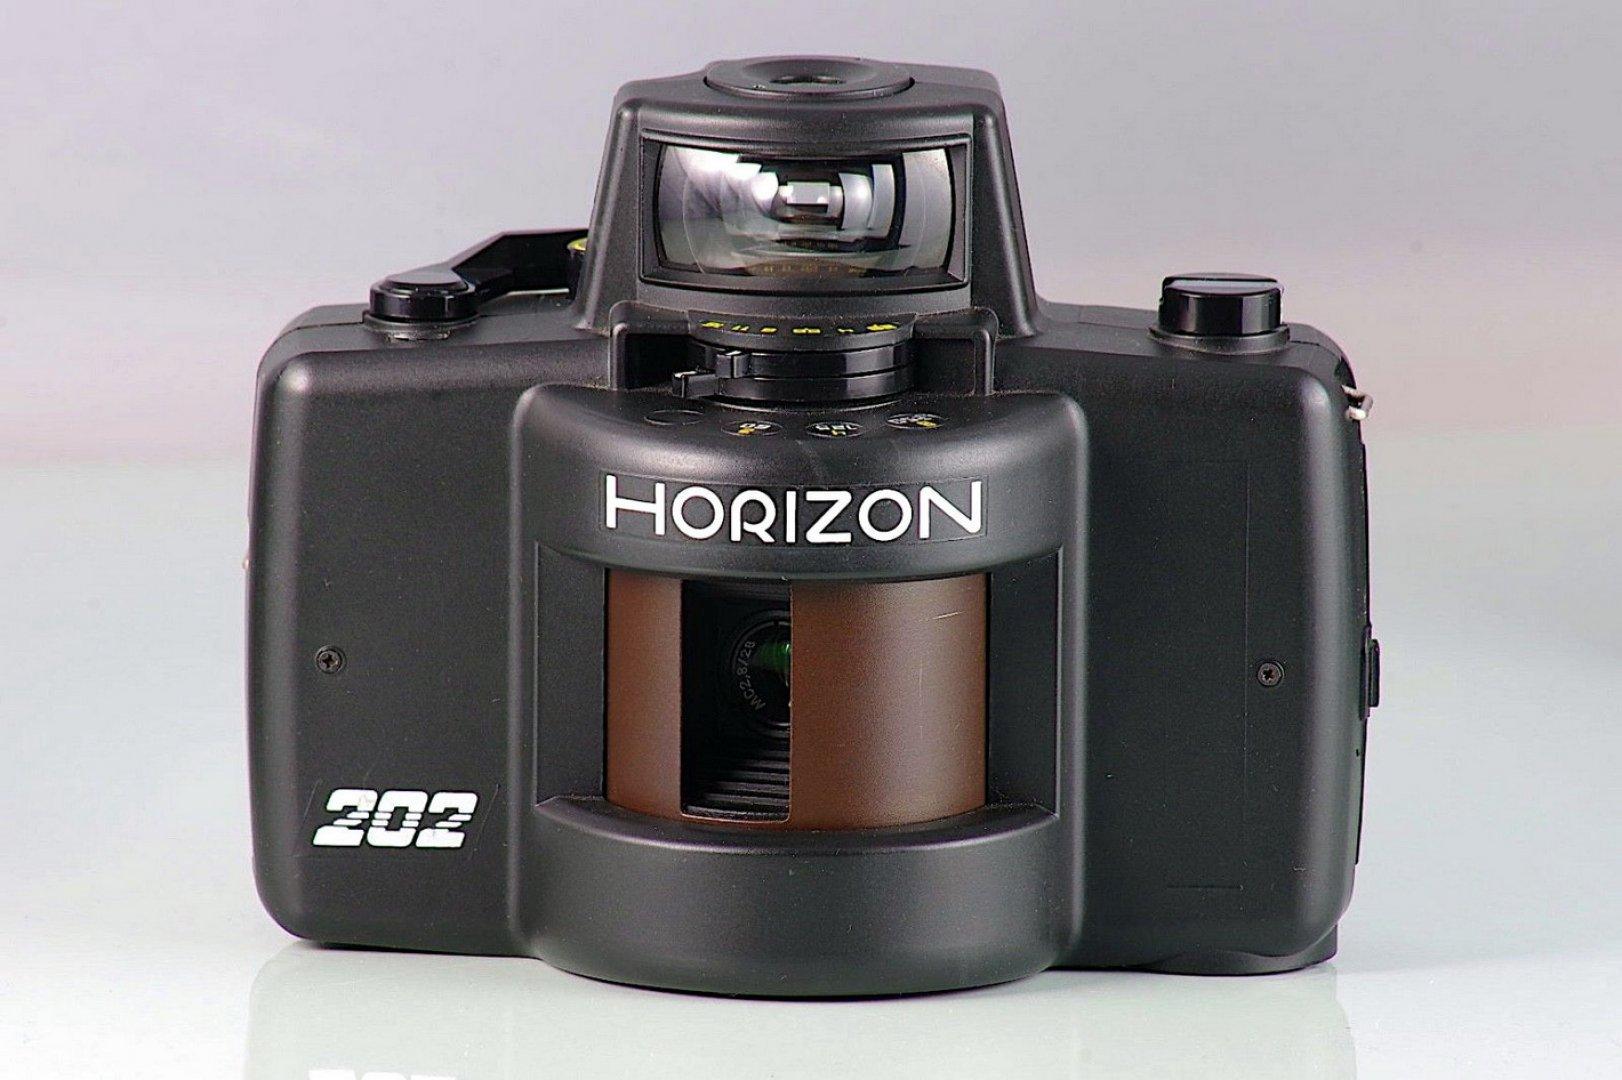 ремонт фотоаппарата горизонт